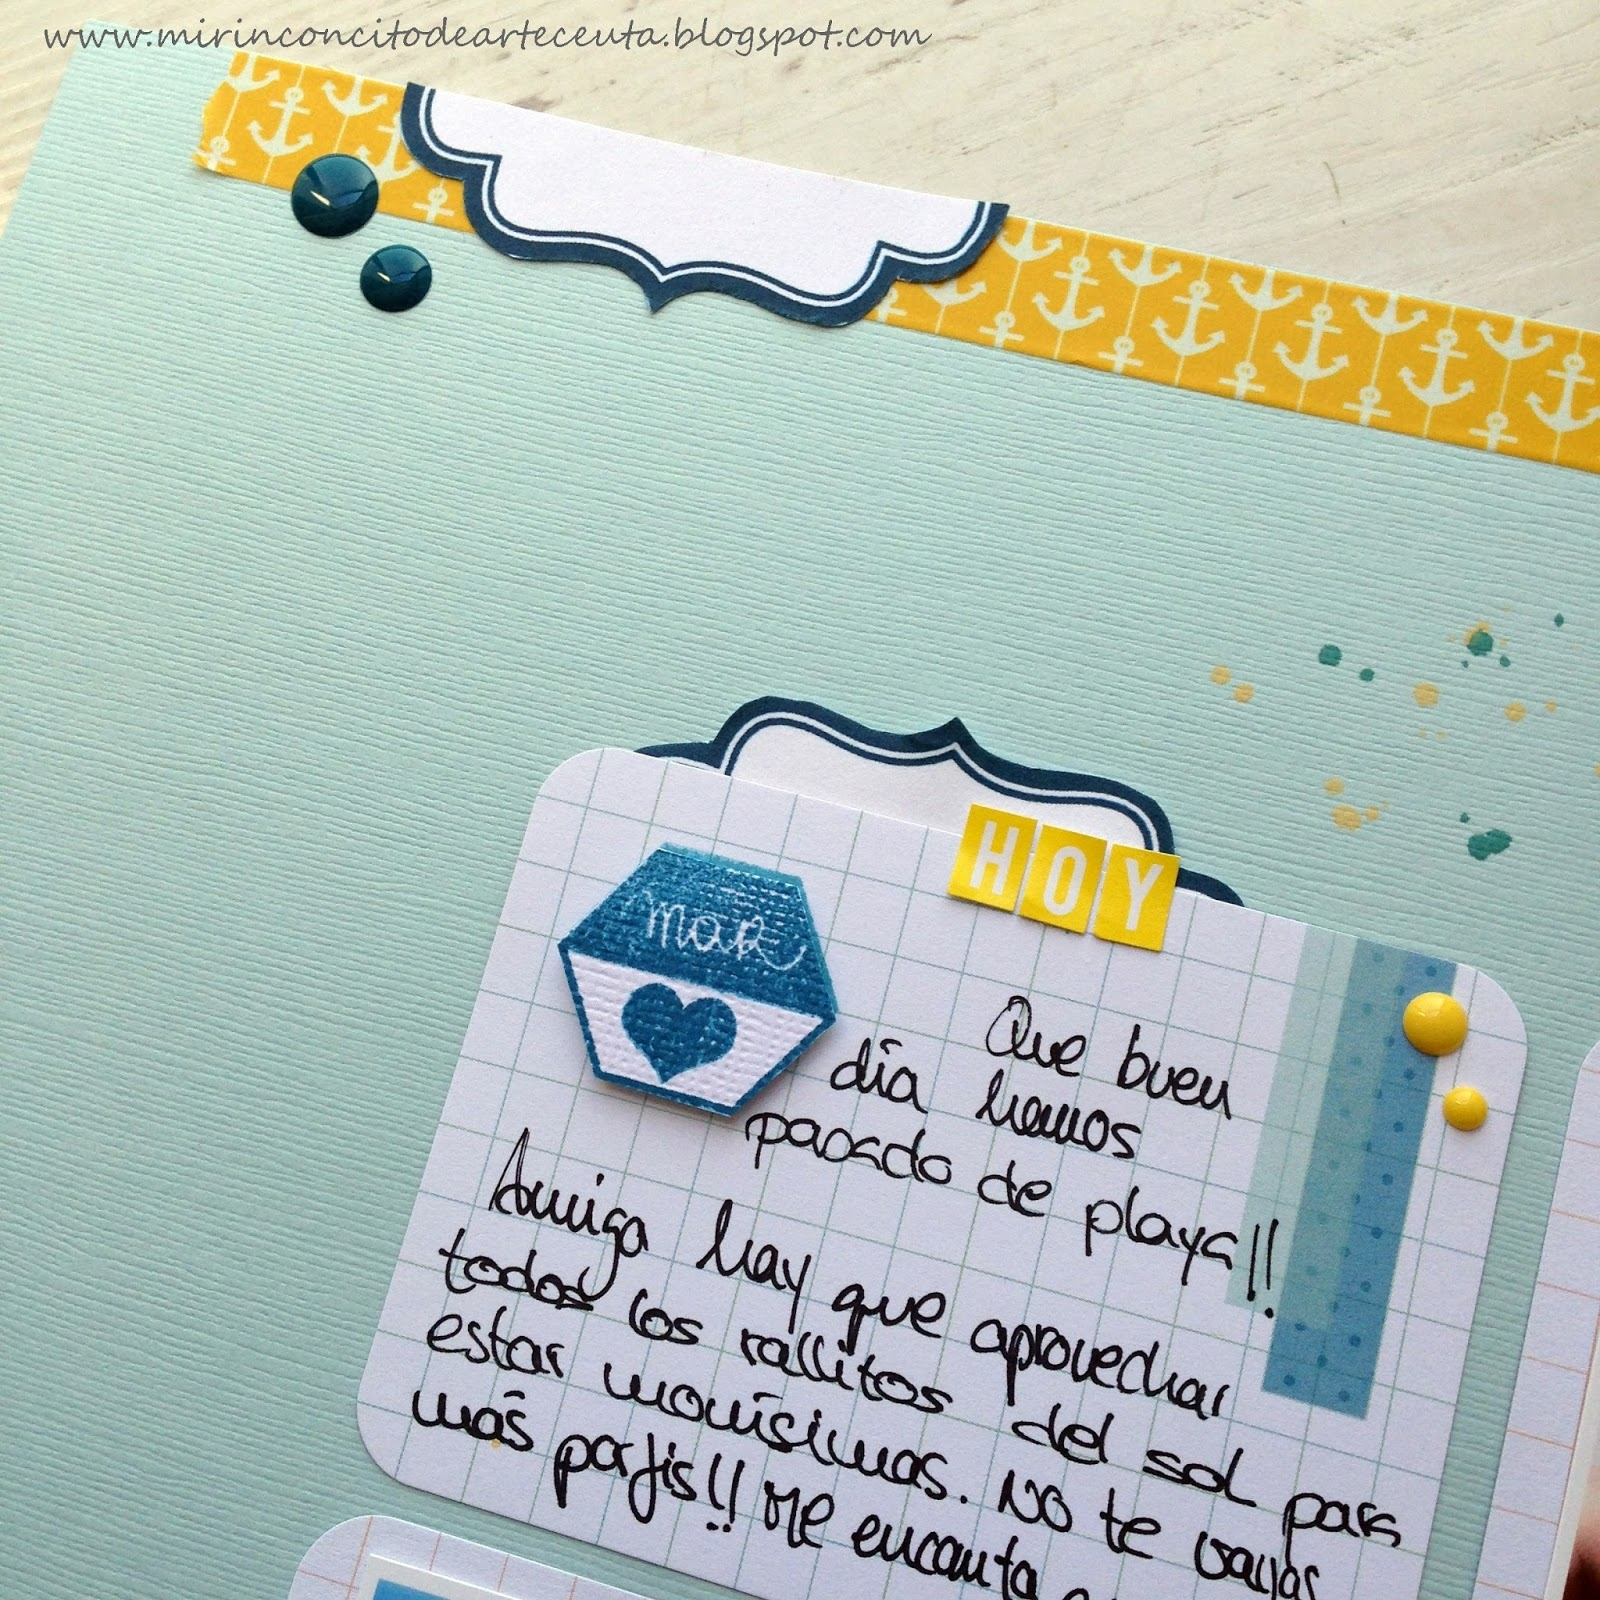 El blog de Macaliu: LAYOUT - HOY TOCA PLAYA